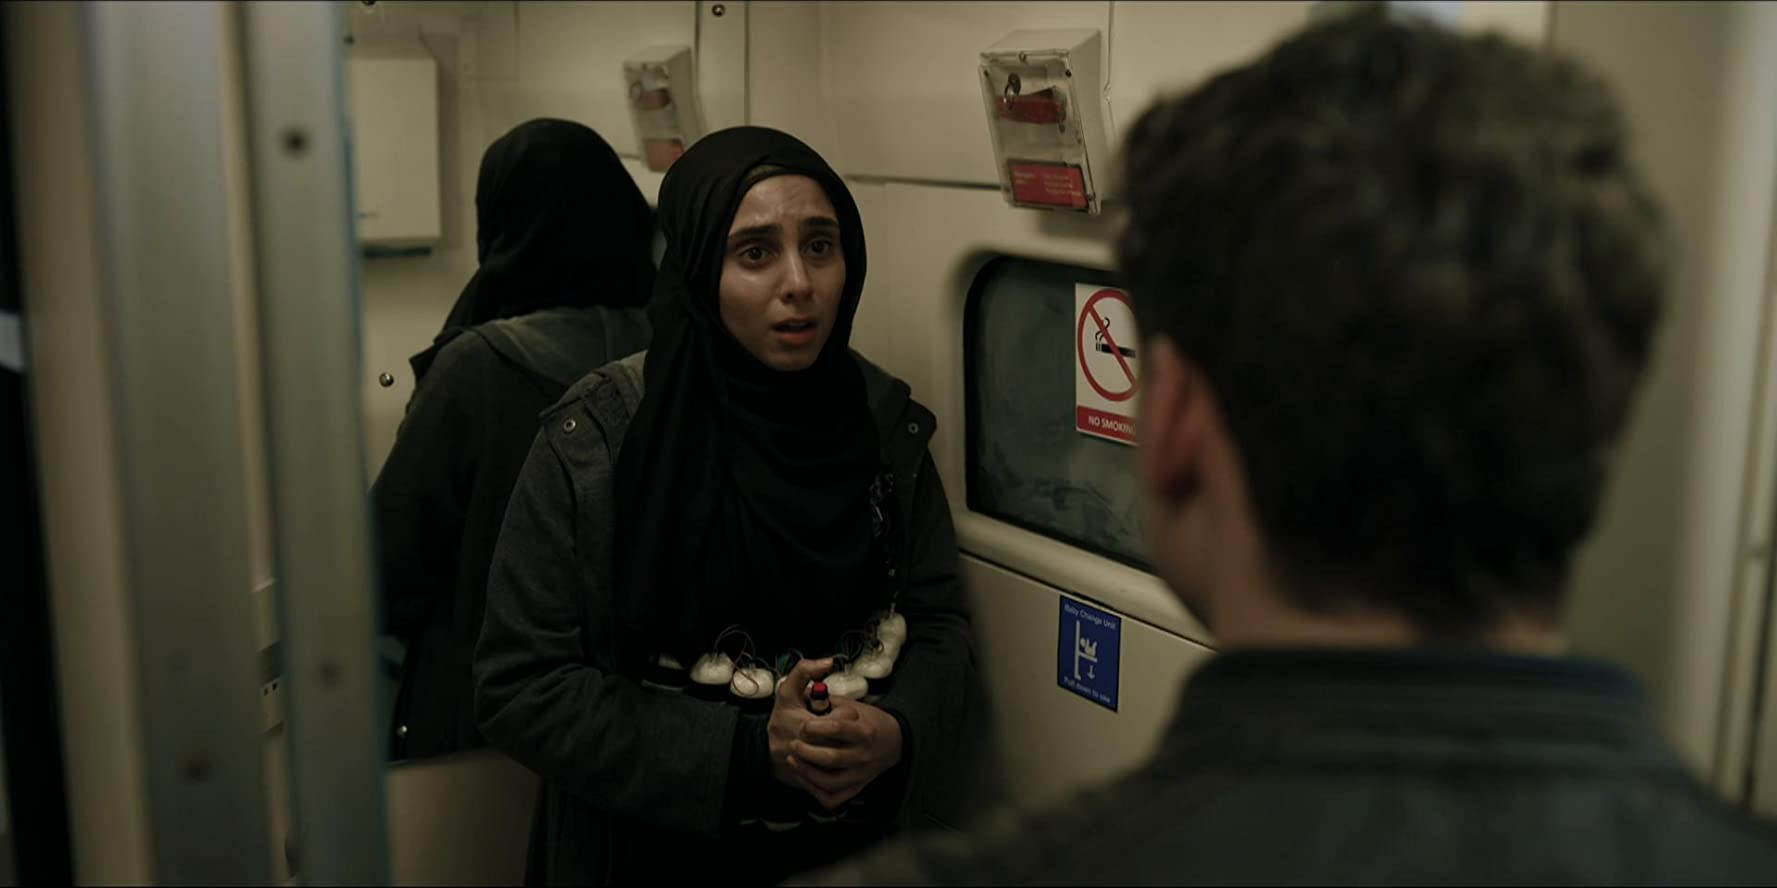 guardaespaldas ayudando atentado bomba